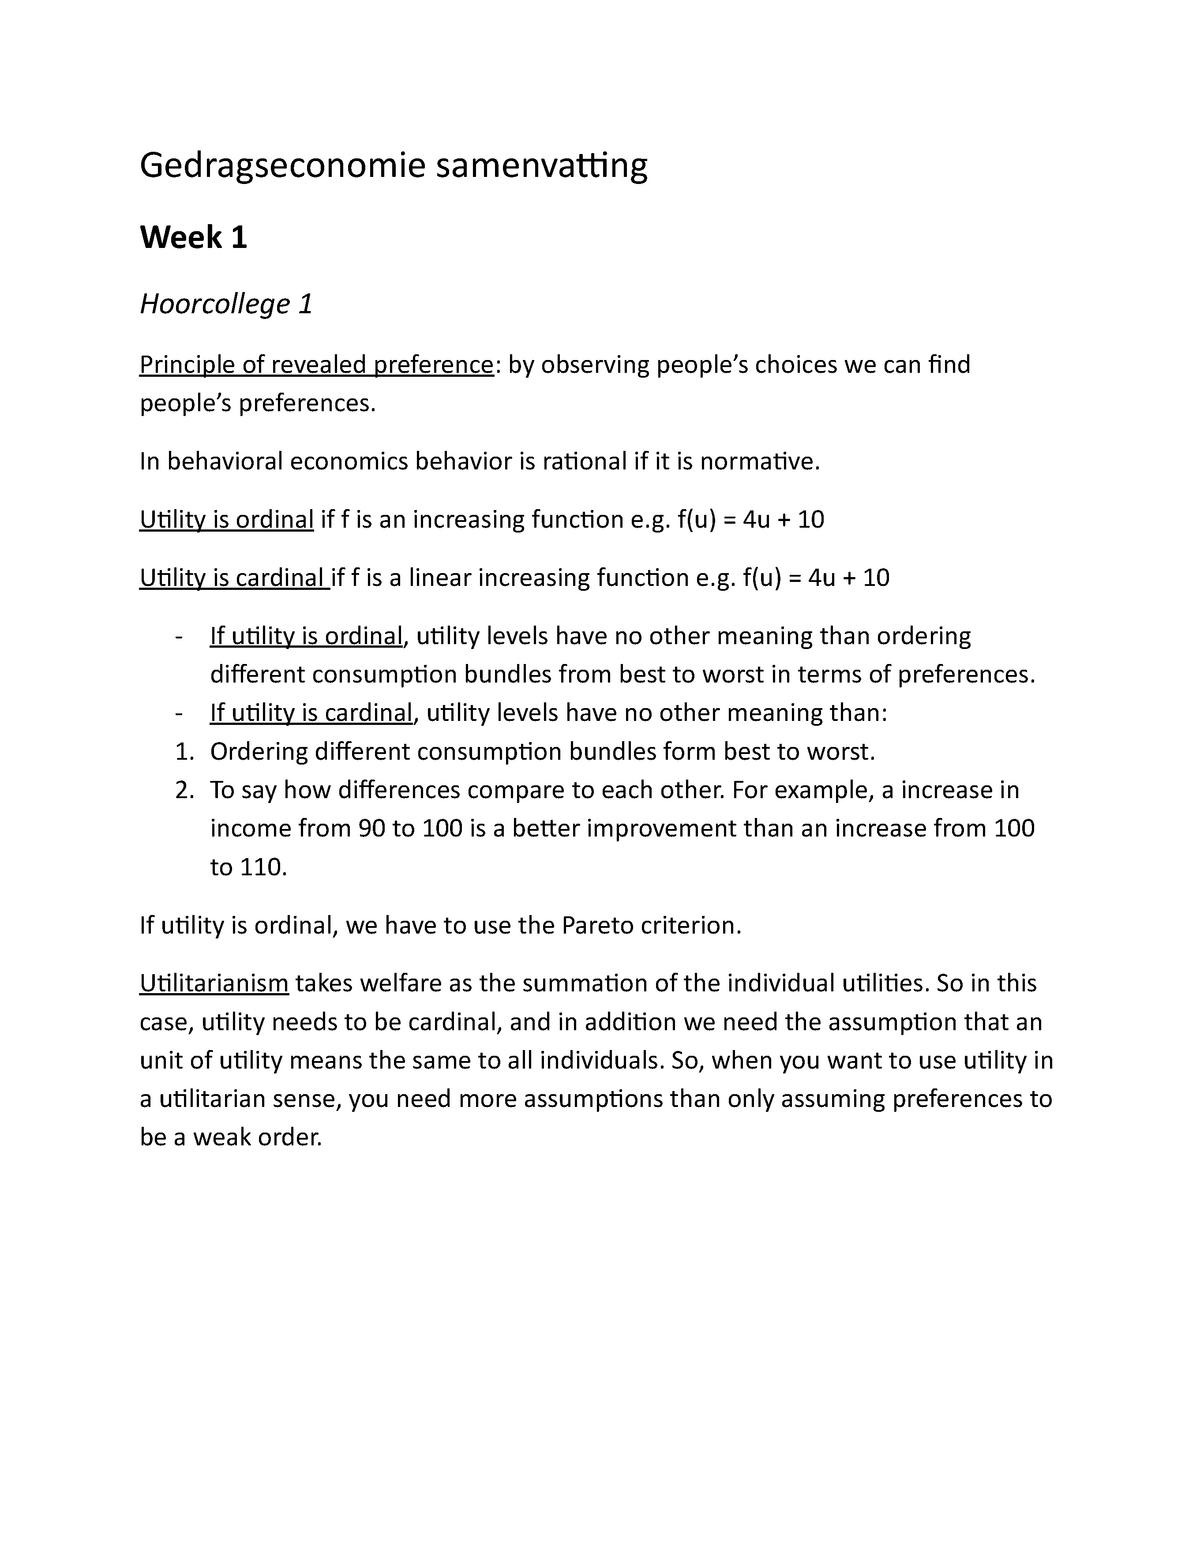 Inleiding gedragseconomie samenvatting - FEB12015: Inleiding